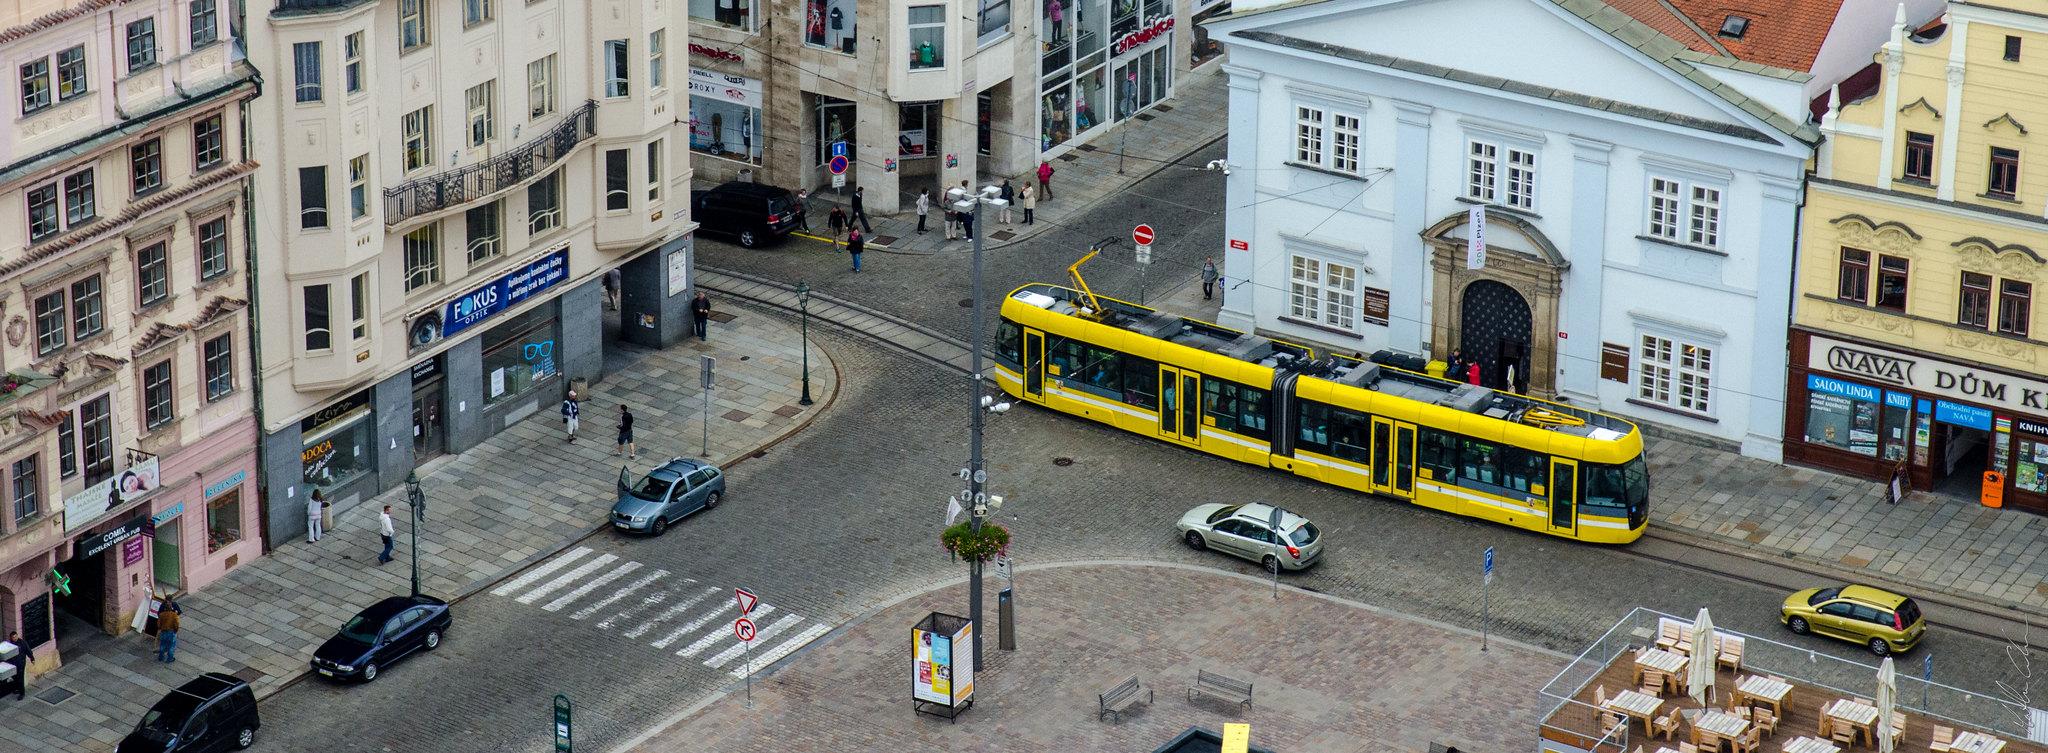 PragueVienneBudapest-Flickr-9